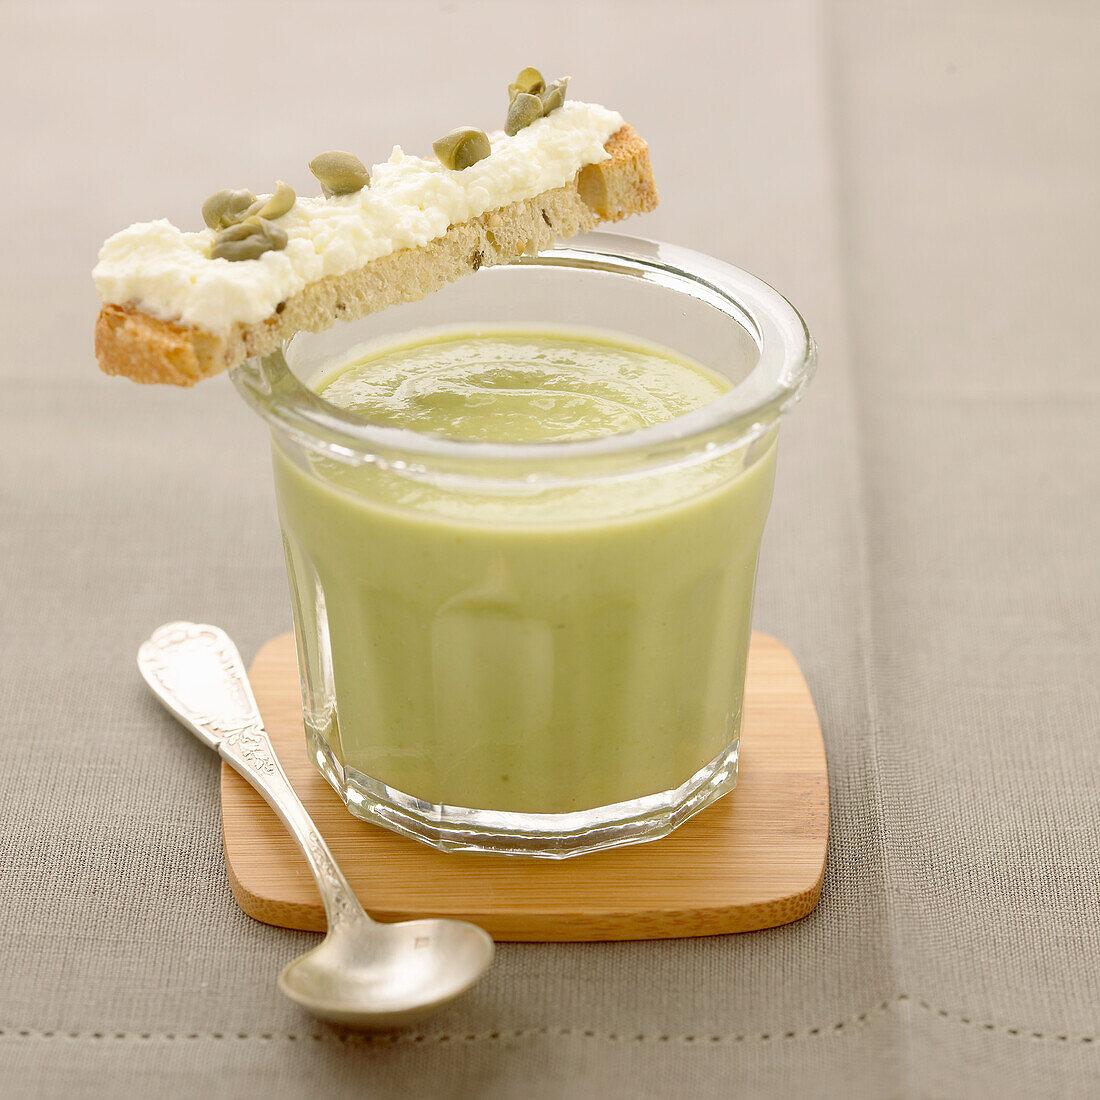 Chicory and avocado Gaspacho